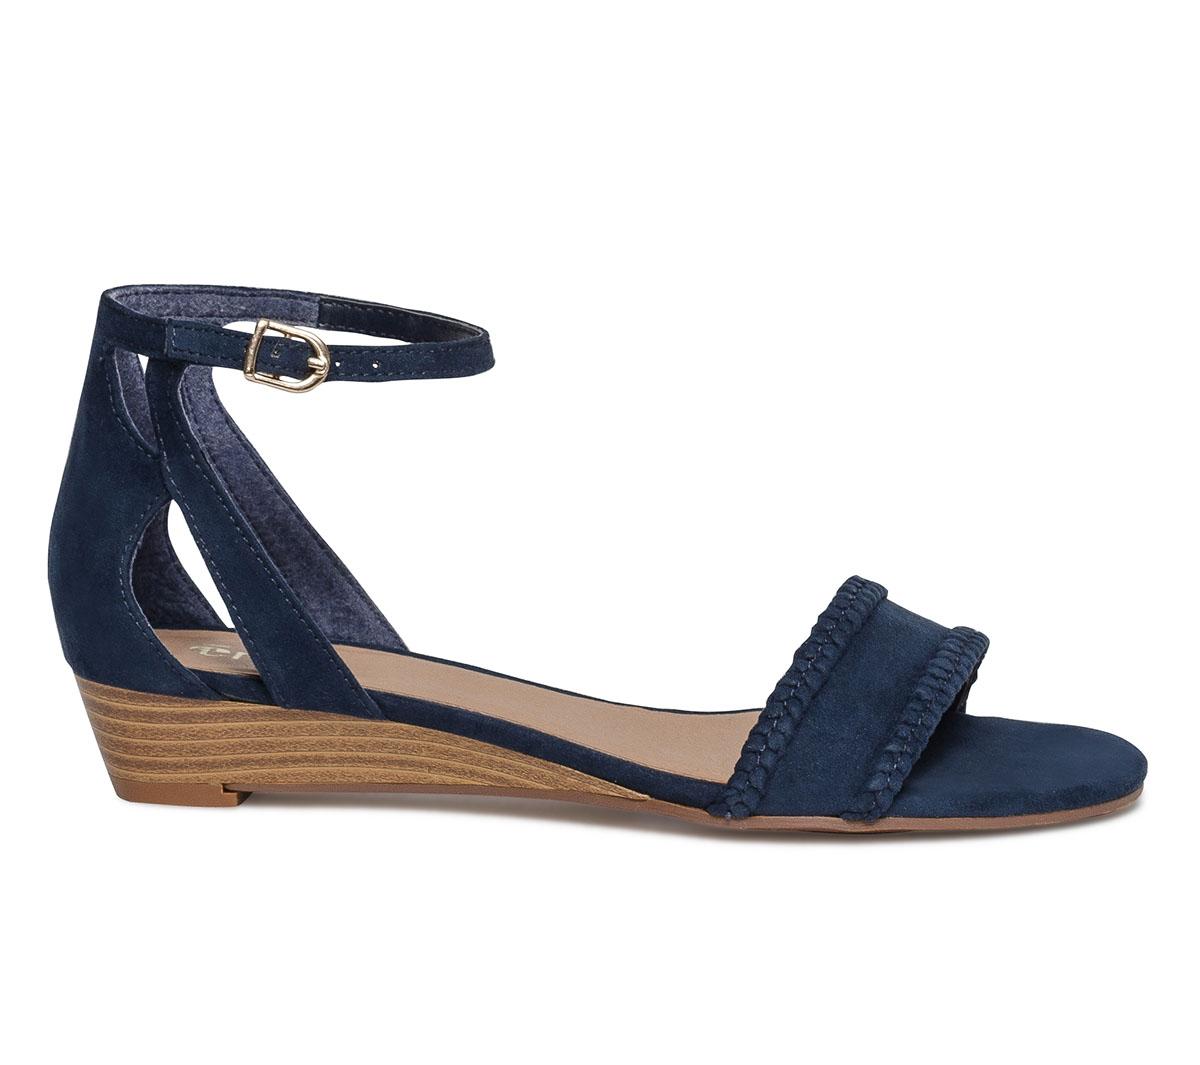 Bleu Compensée Sandale Eram Eram Marine Bleu Marine Sandale Compensée Sandale Eram Compensée WH2eIYD9Eb